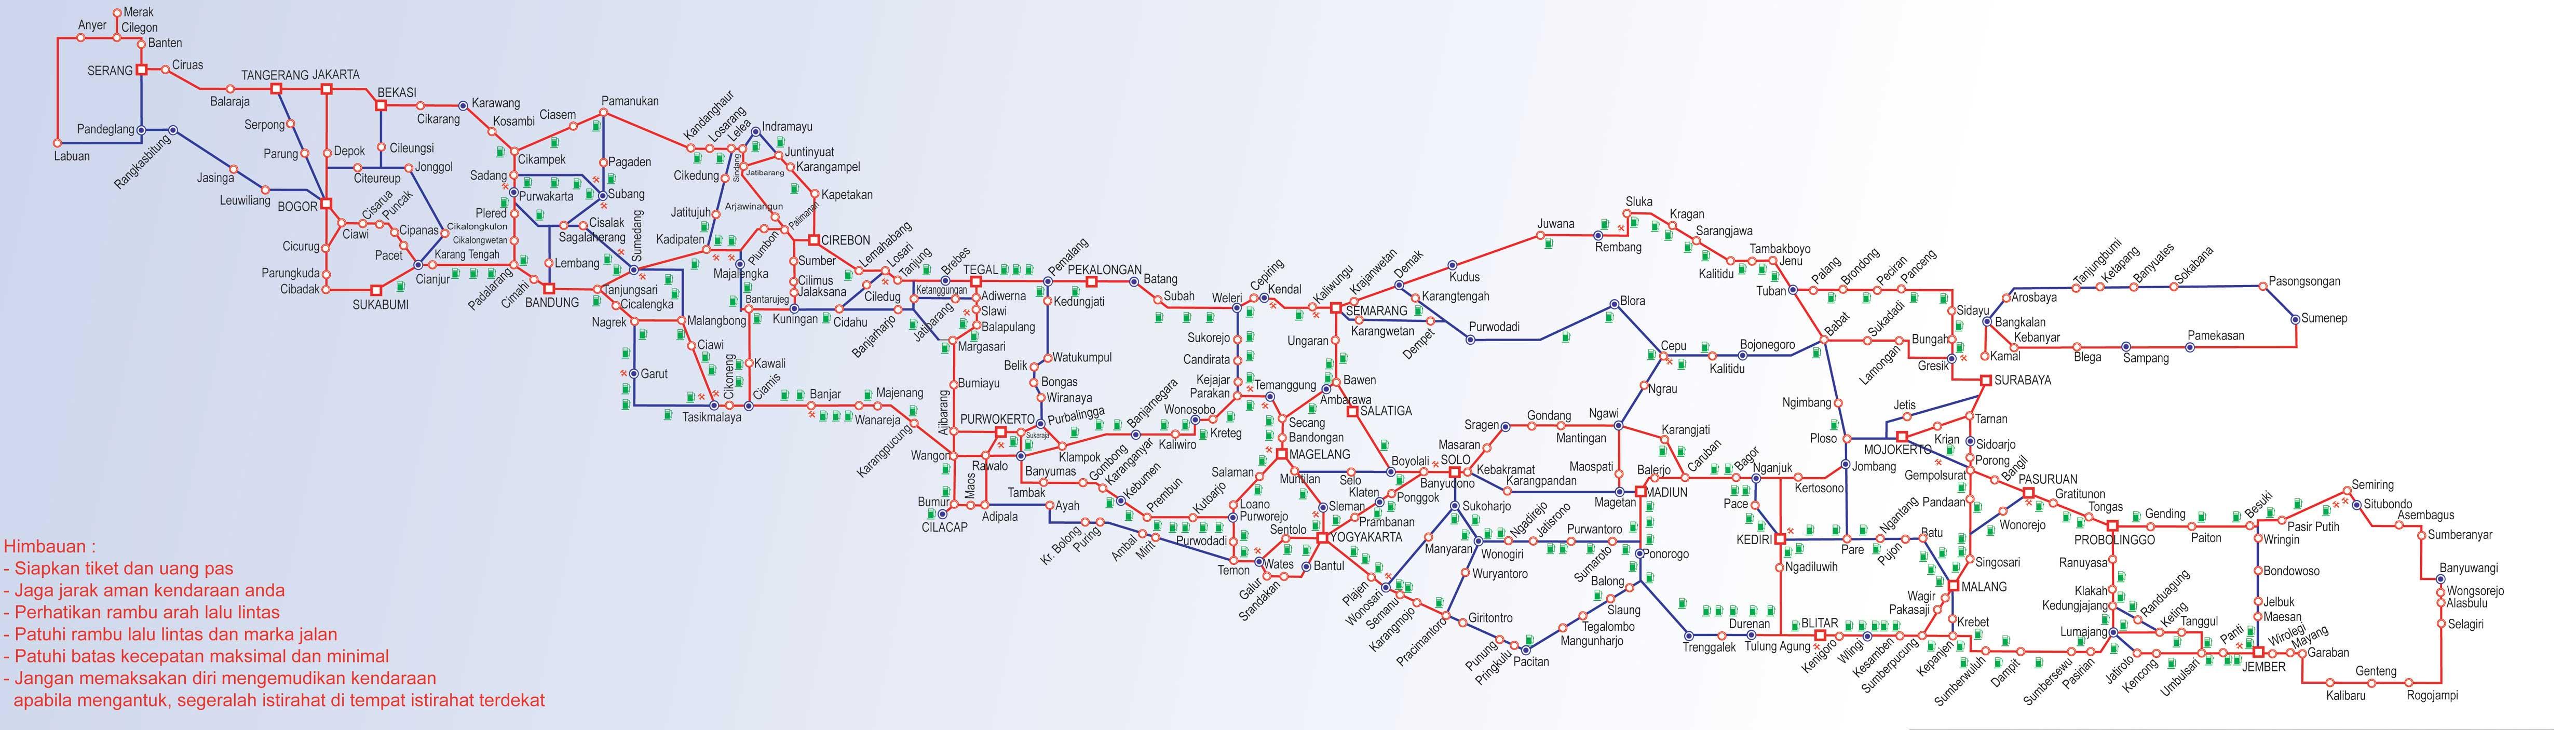 Peta Mudik 2013| Jalur Utara -Jalur Tengah-Jalur Selatan | Jalur Mudik